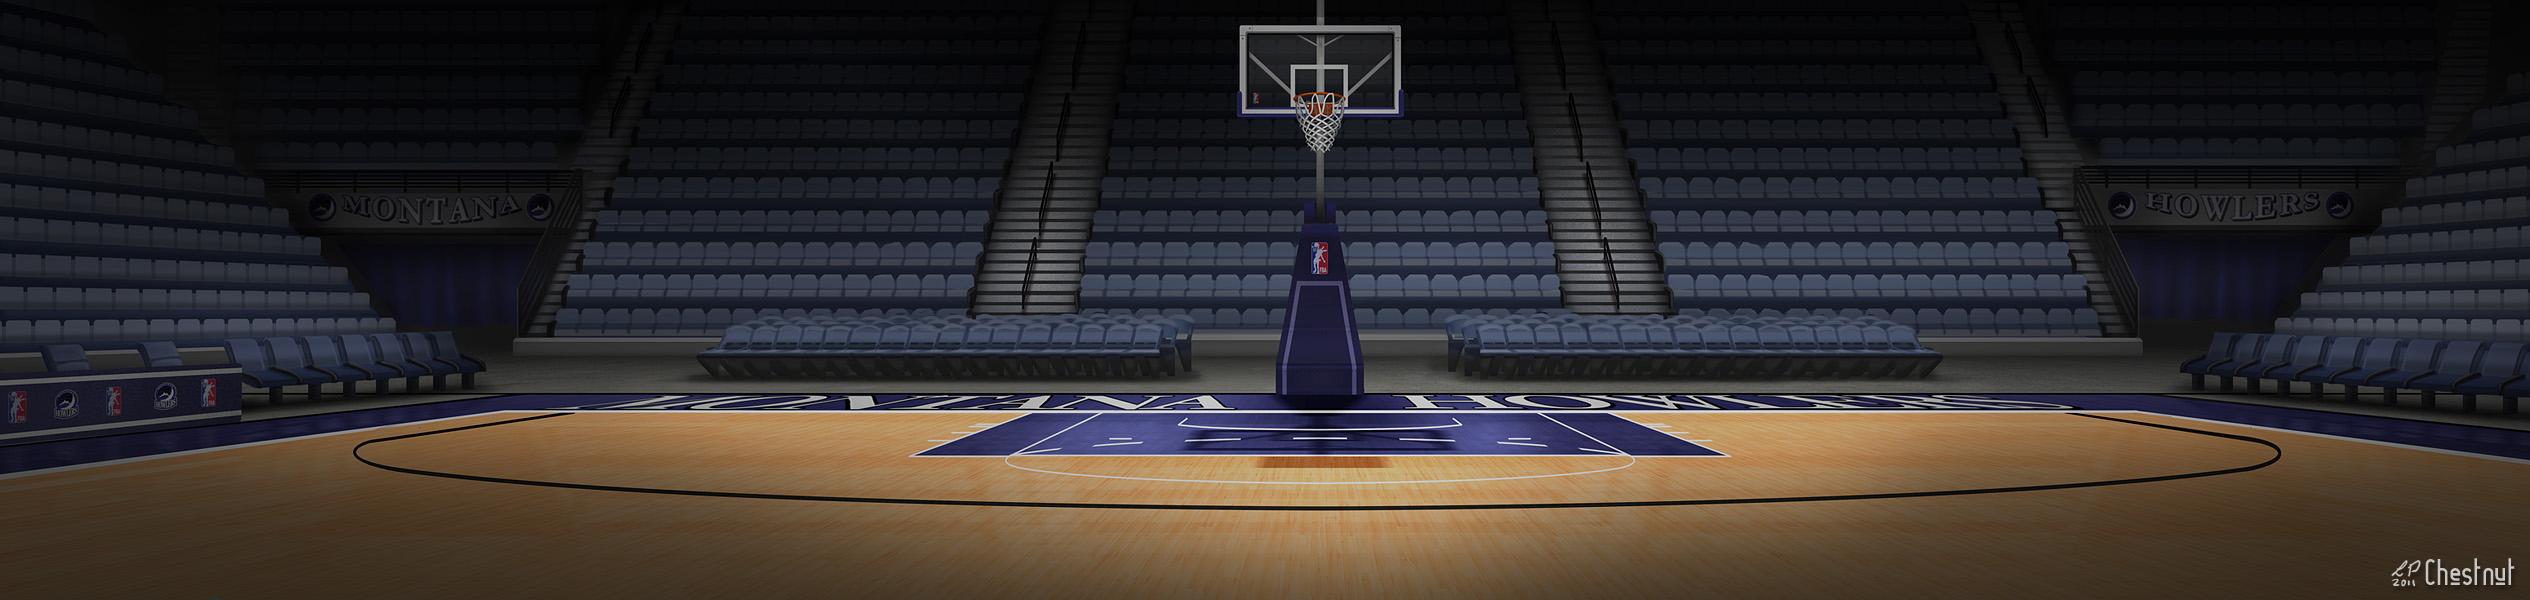 FBA Basketball Court by FriendlyChestnut on DeviantArt